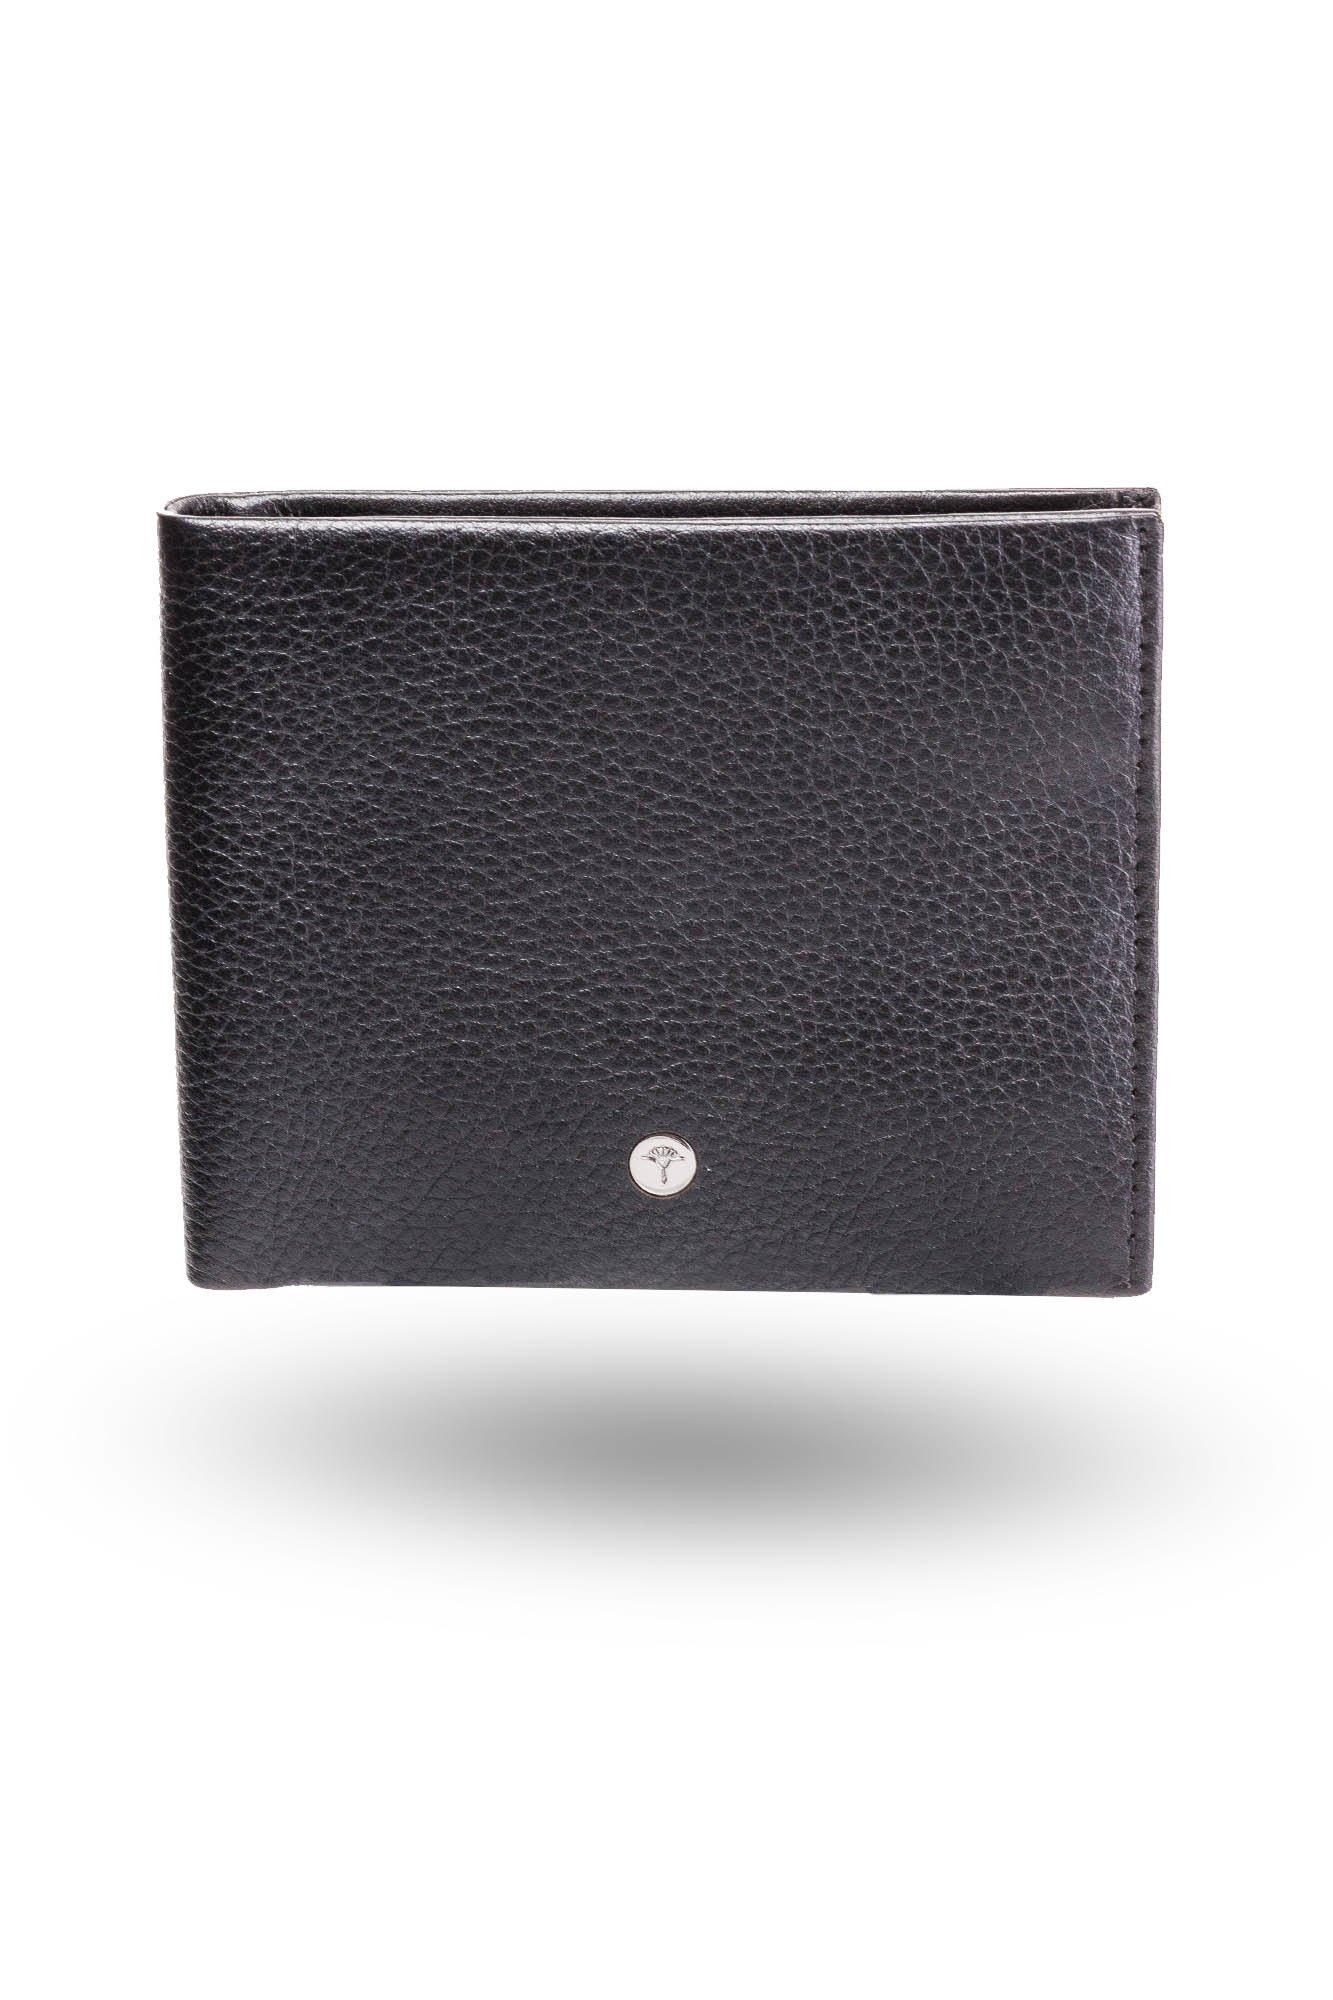 18690c44dcfce ... Czarny skórzany portfel męski Orestes Wallet H8 ...